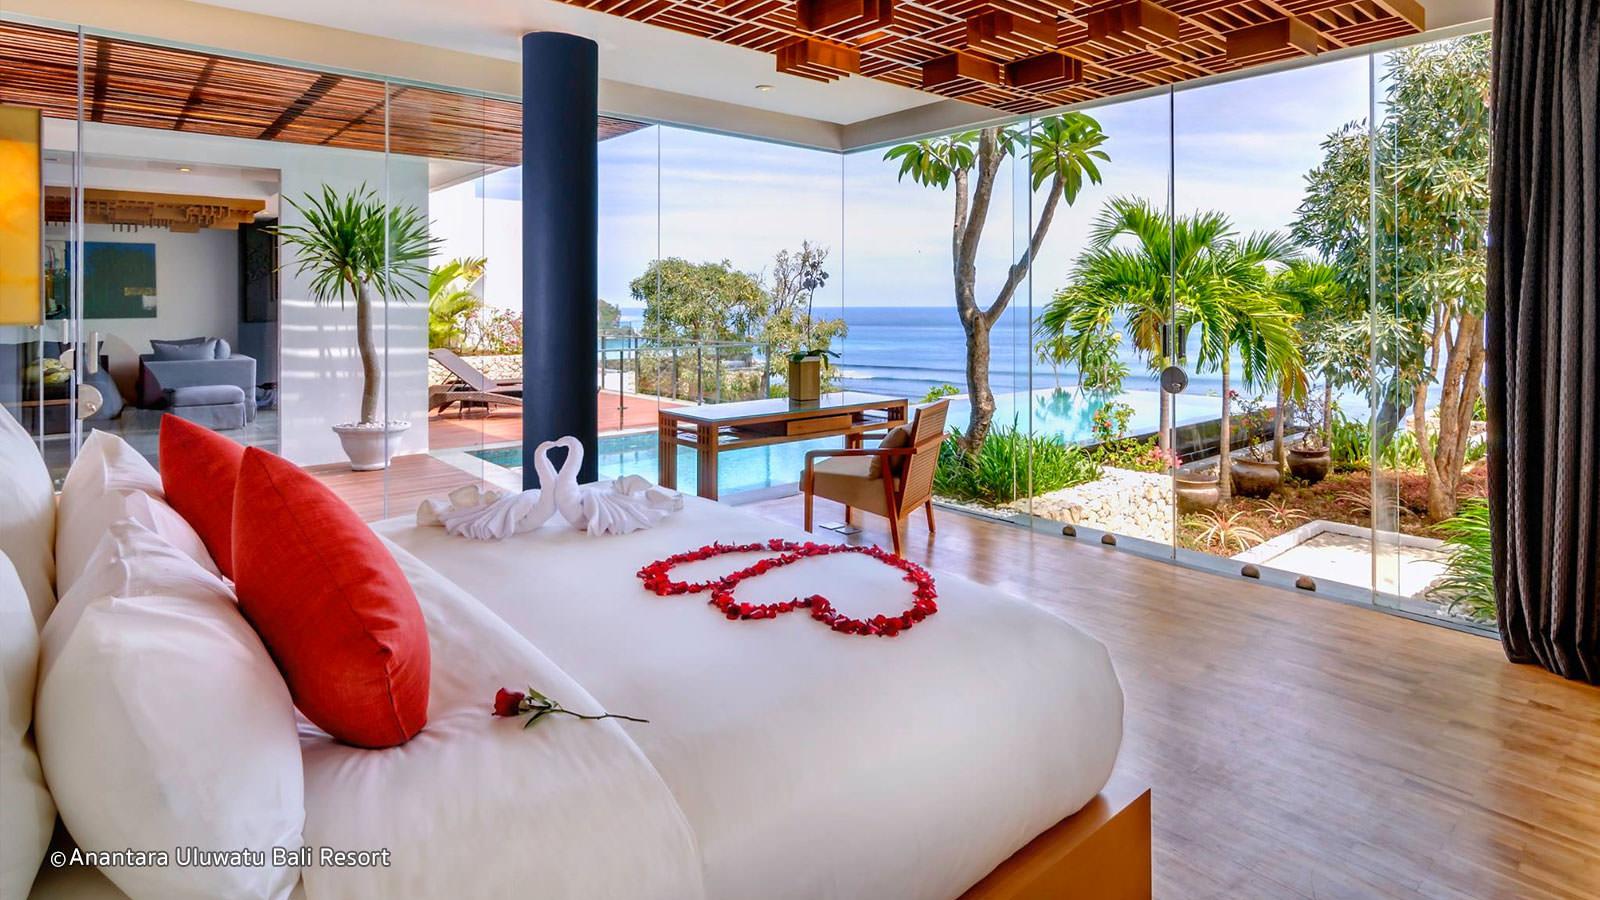 Ubud honeymoon resorts 5 star